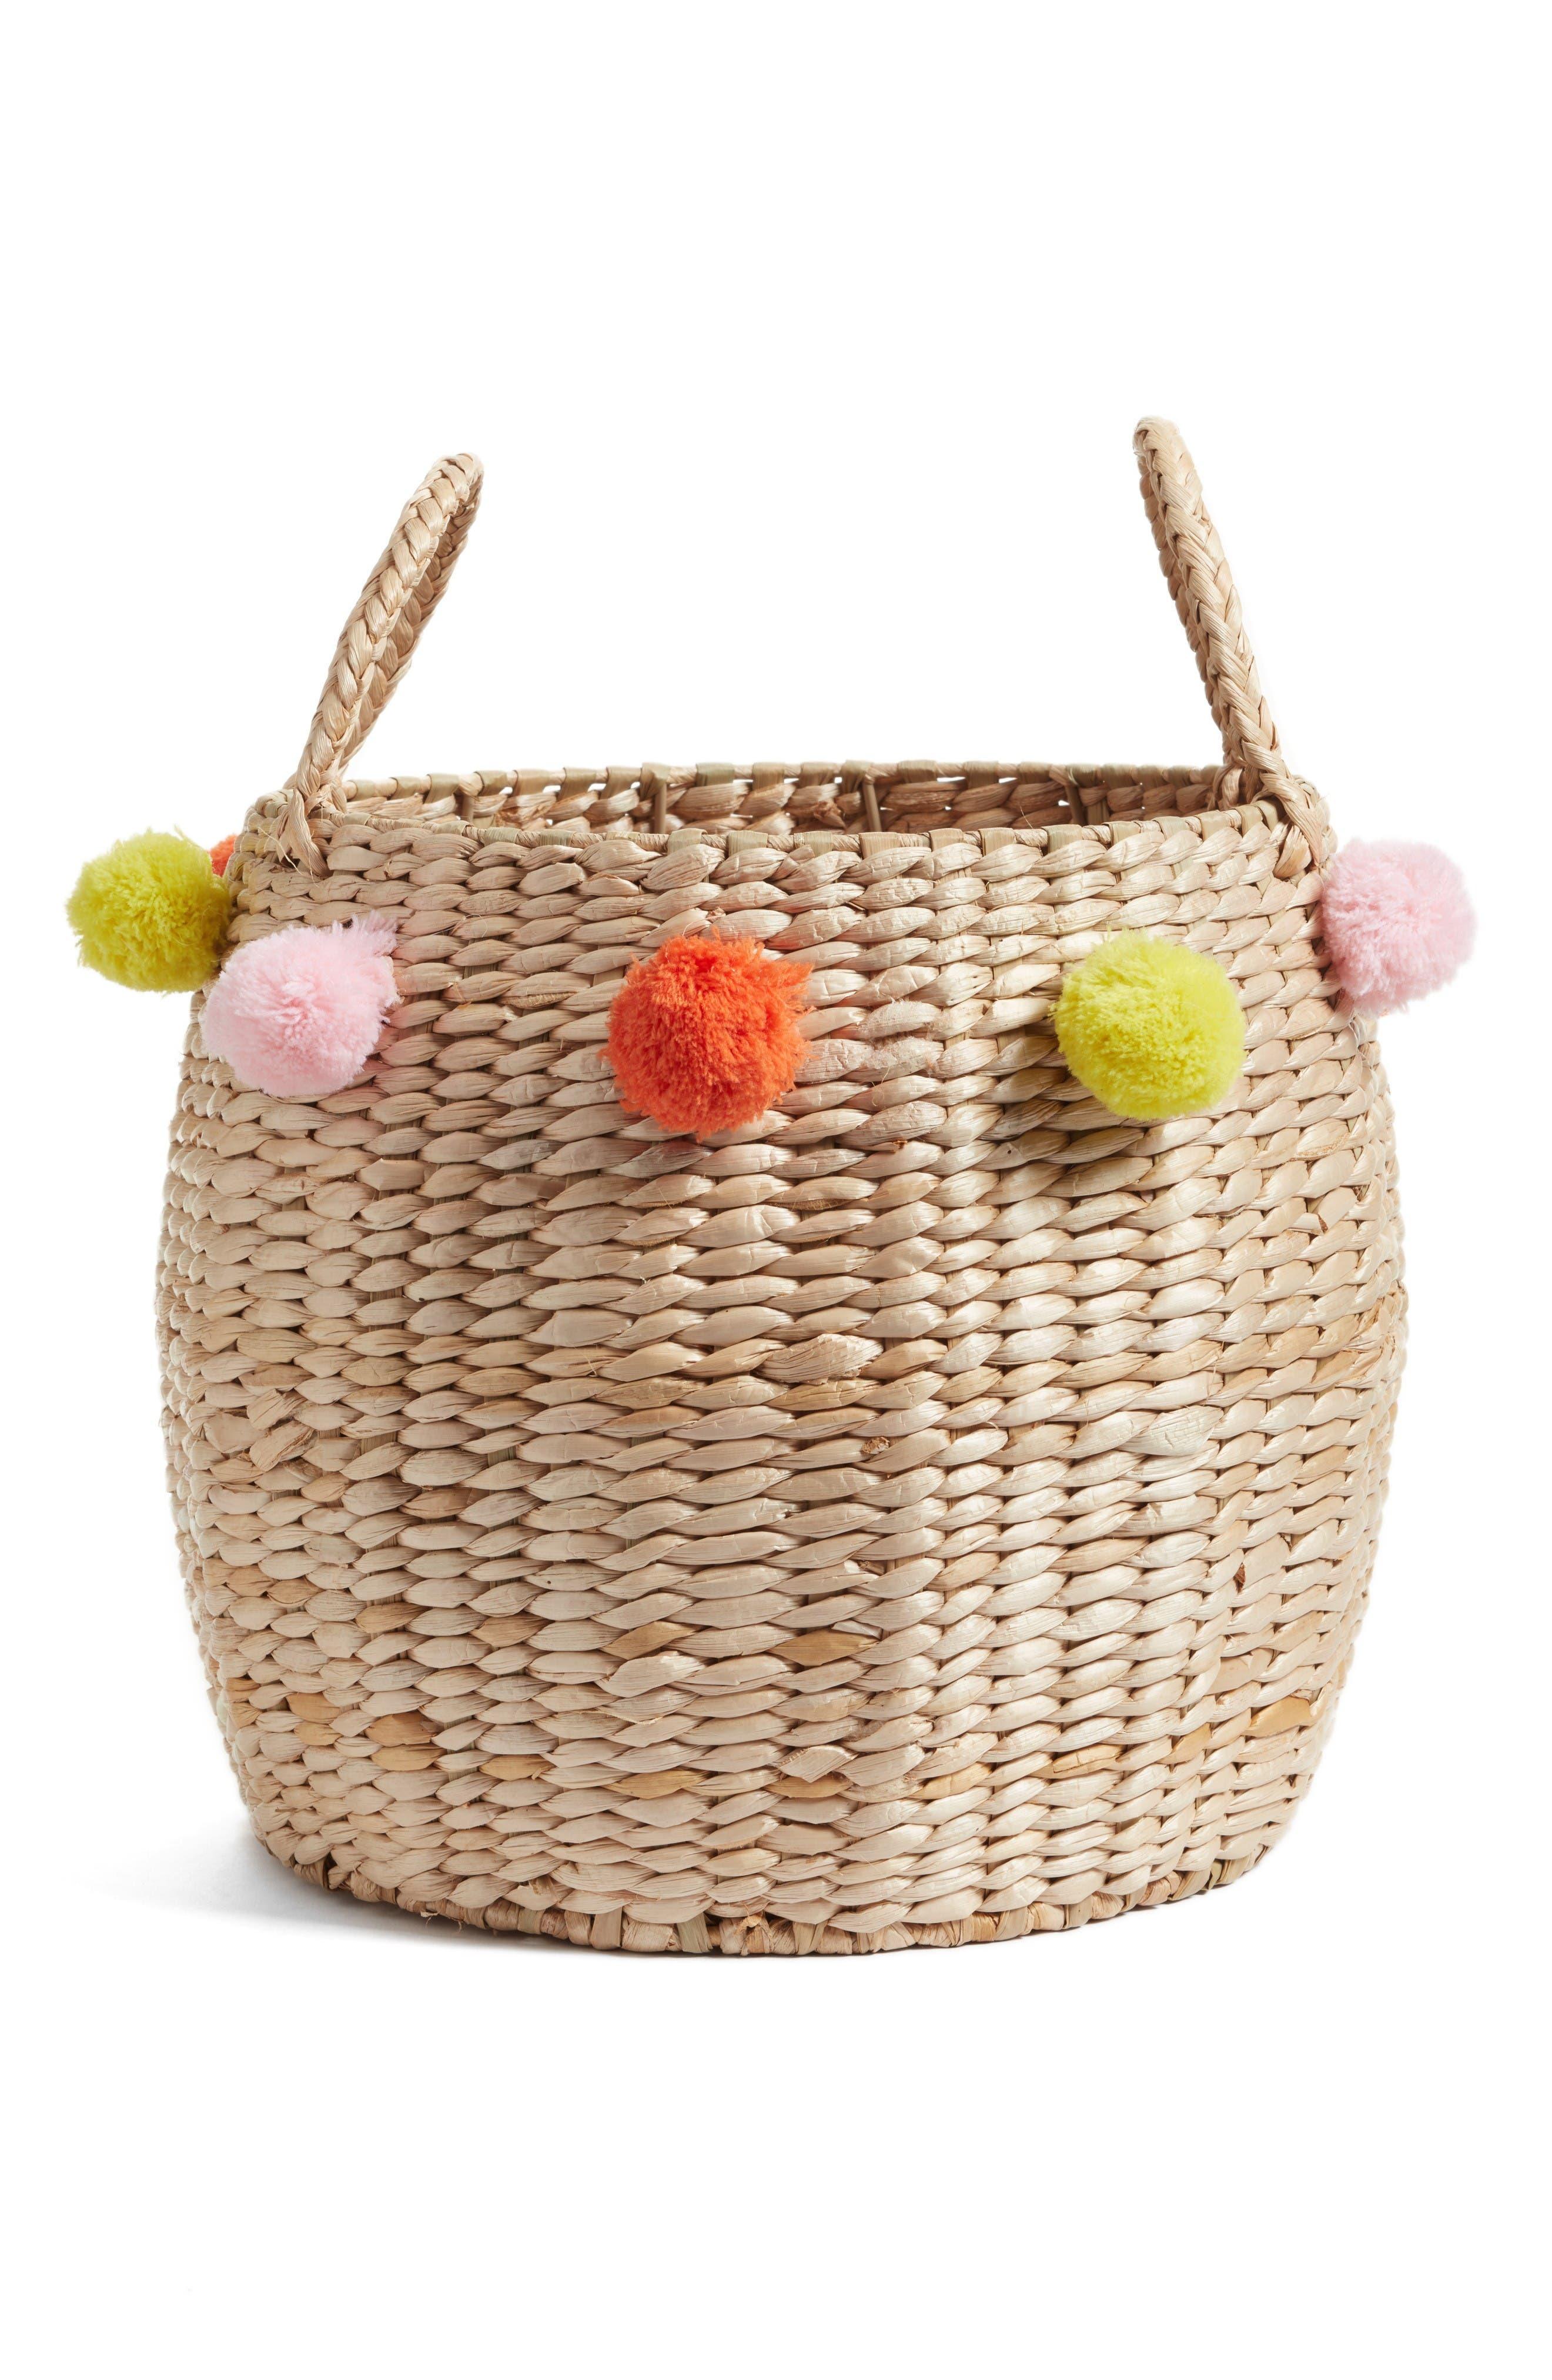 Alternate Image 1 Selected - Levtex Pompom Wicker Basket